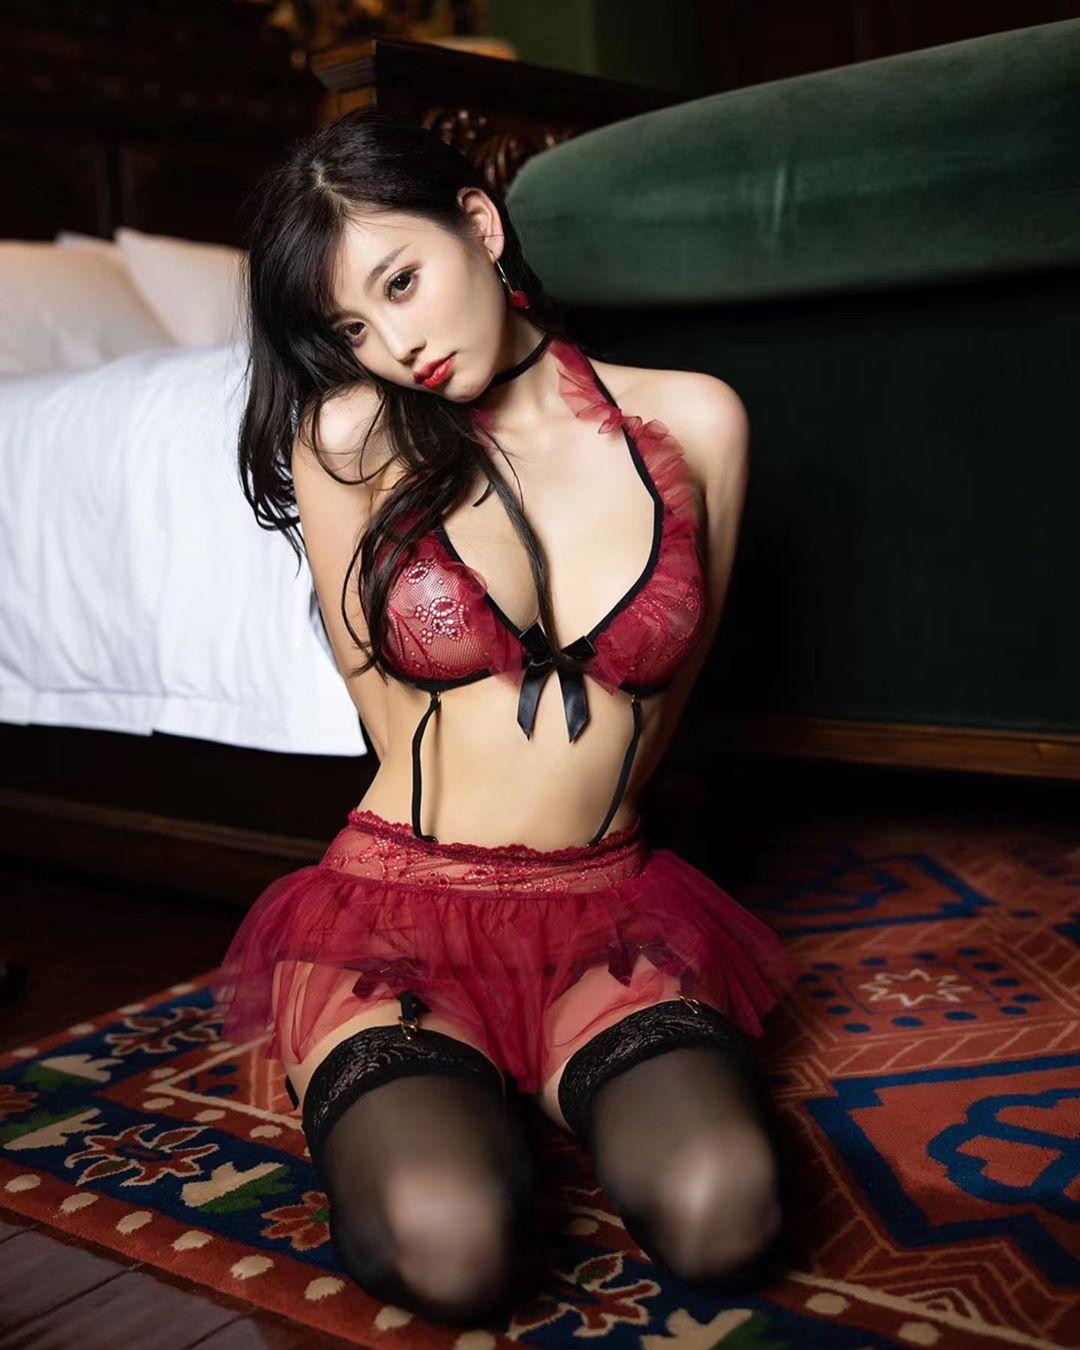 iI4JhkgS o - IG正妹—楊晨晨 (2)